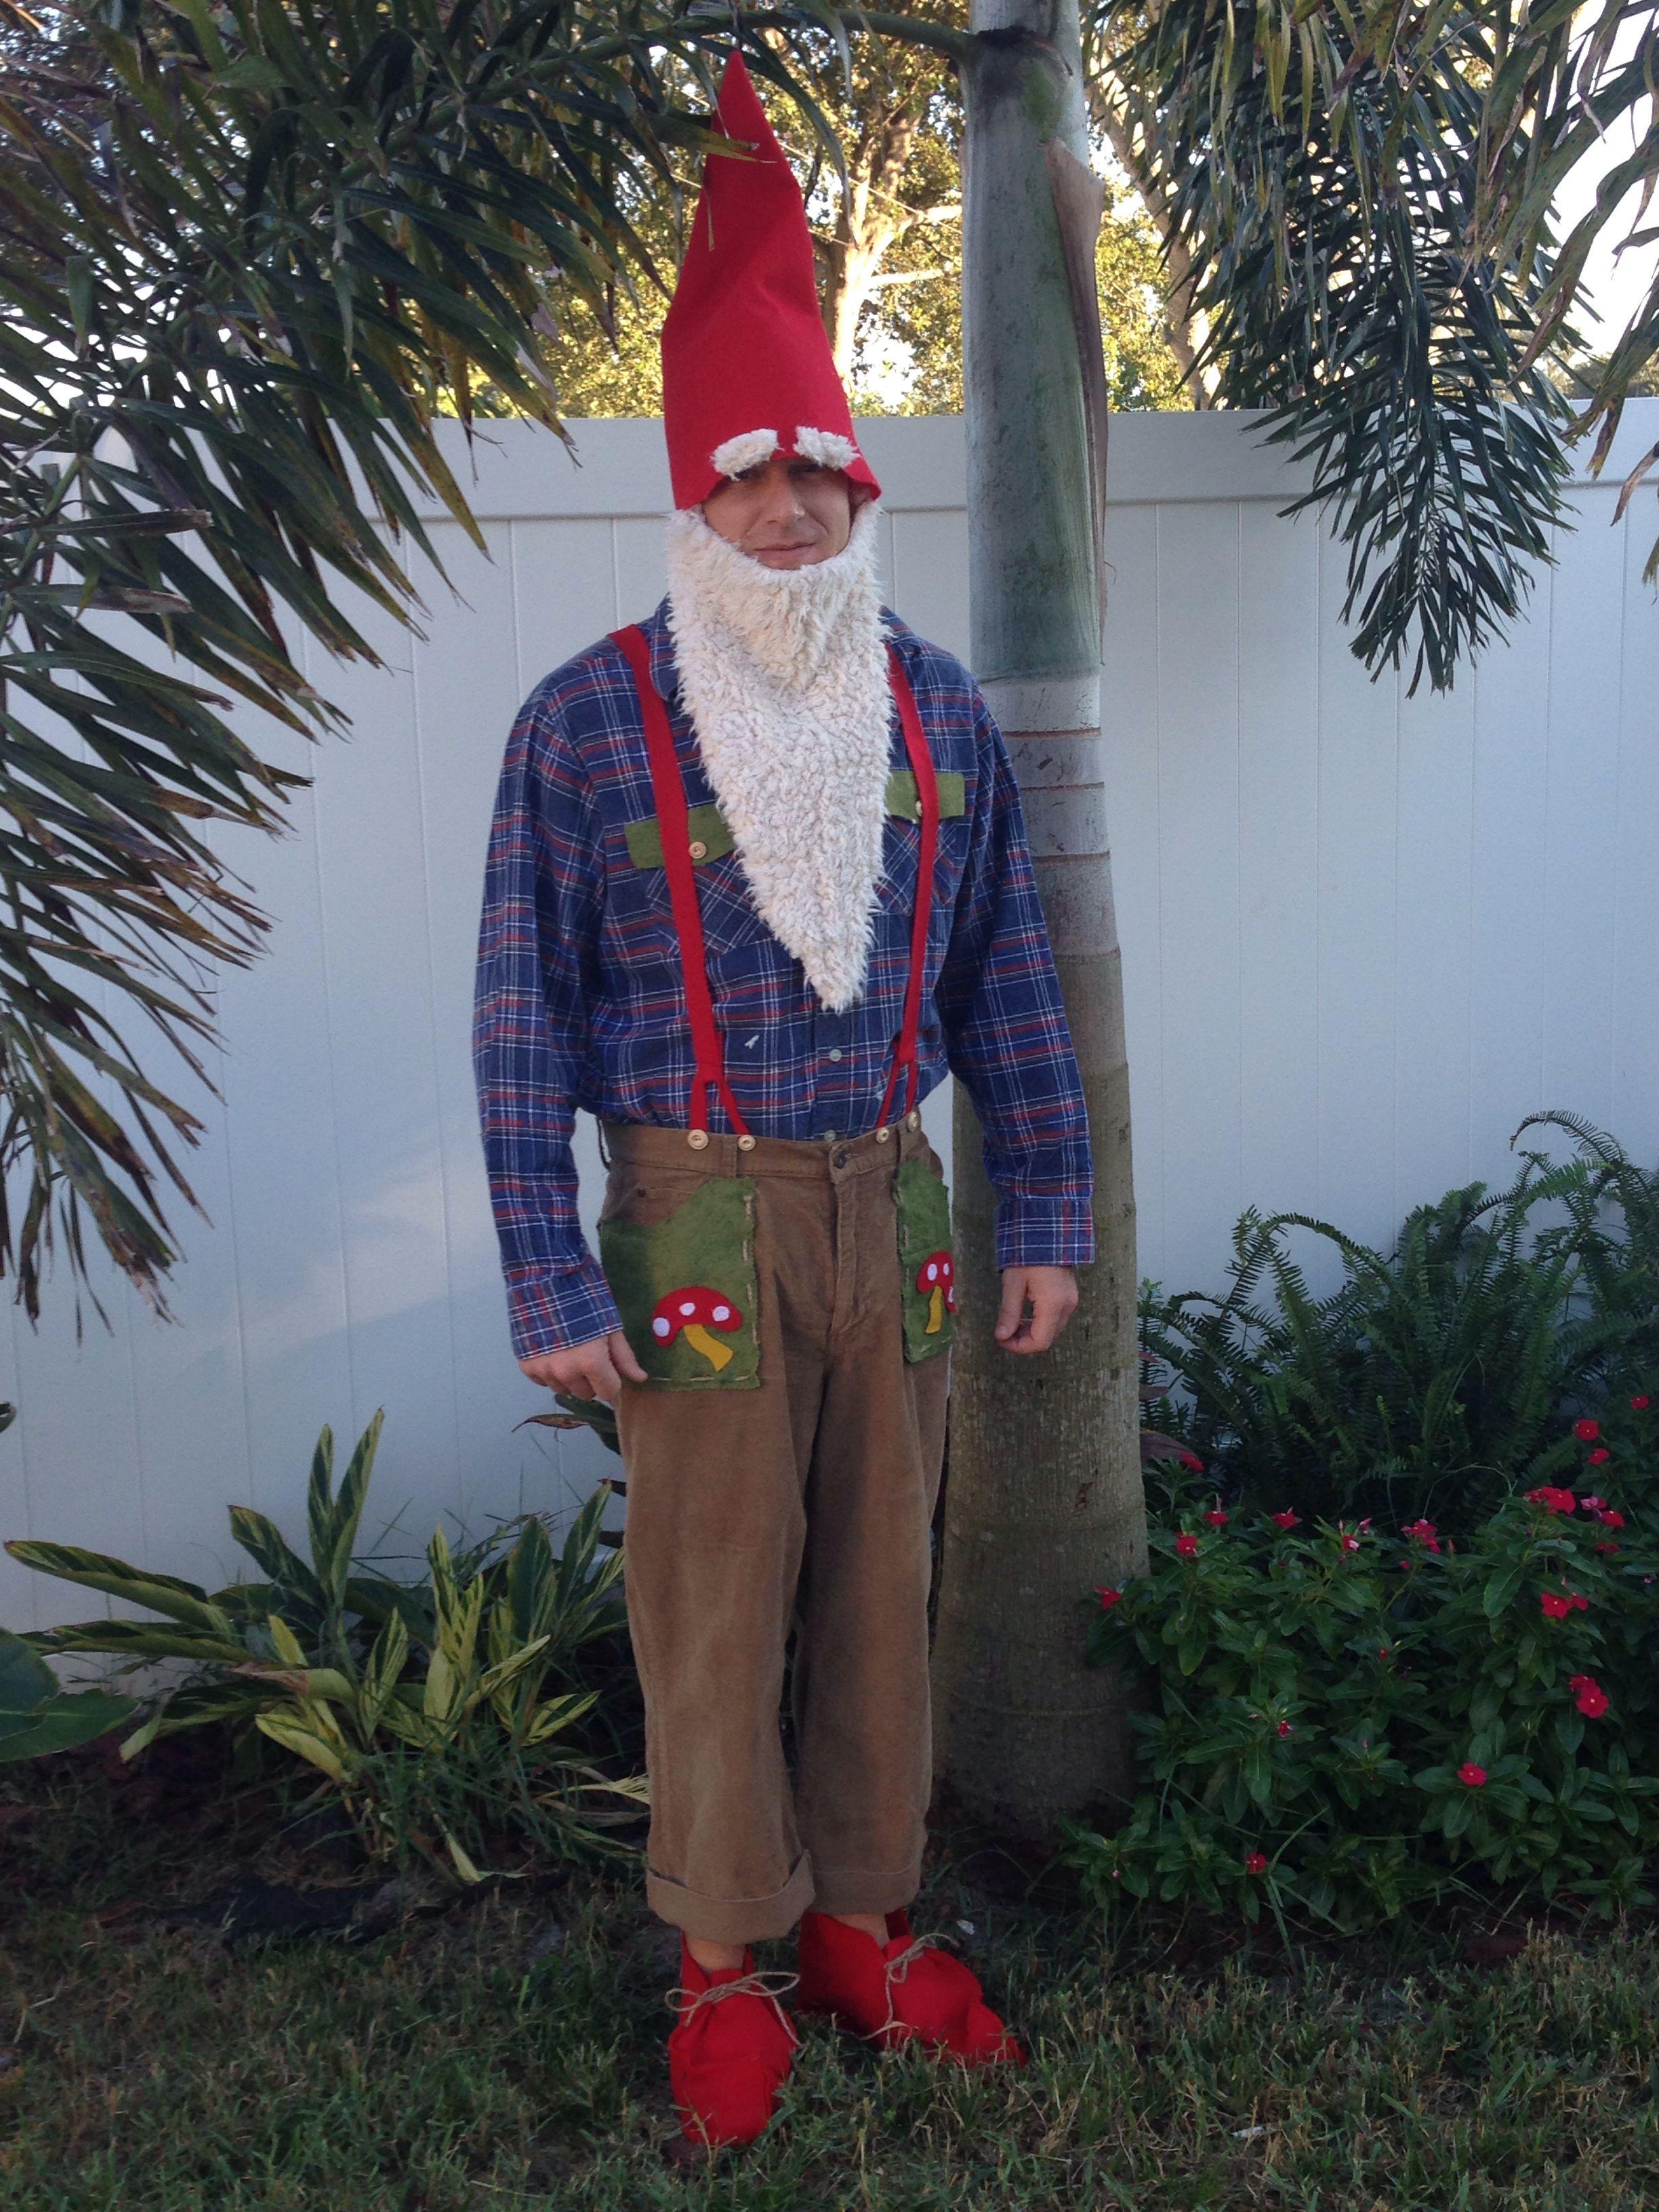 Handmade gnome costume                                                                                                                                                                                 More #gnomecostume